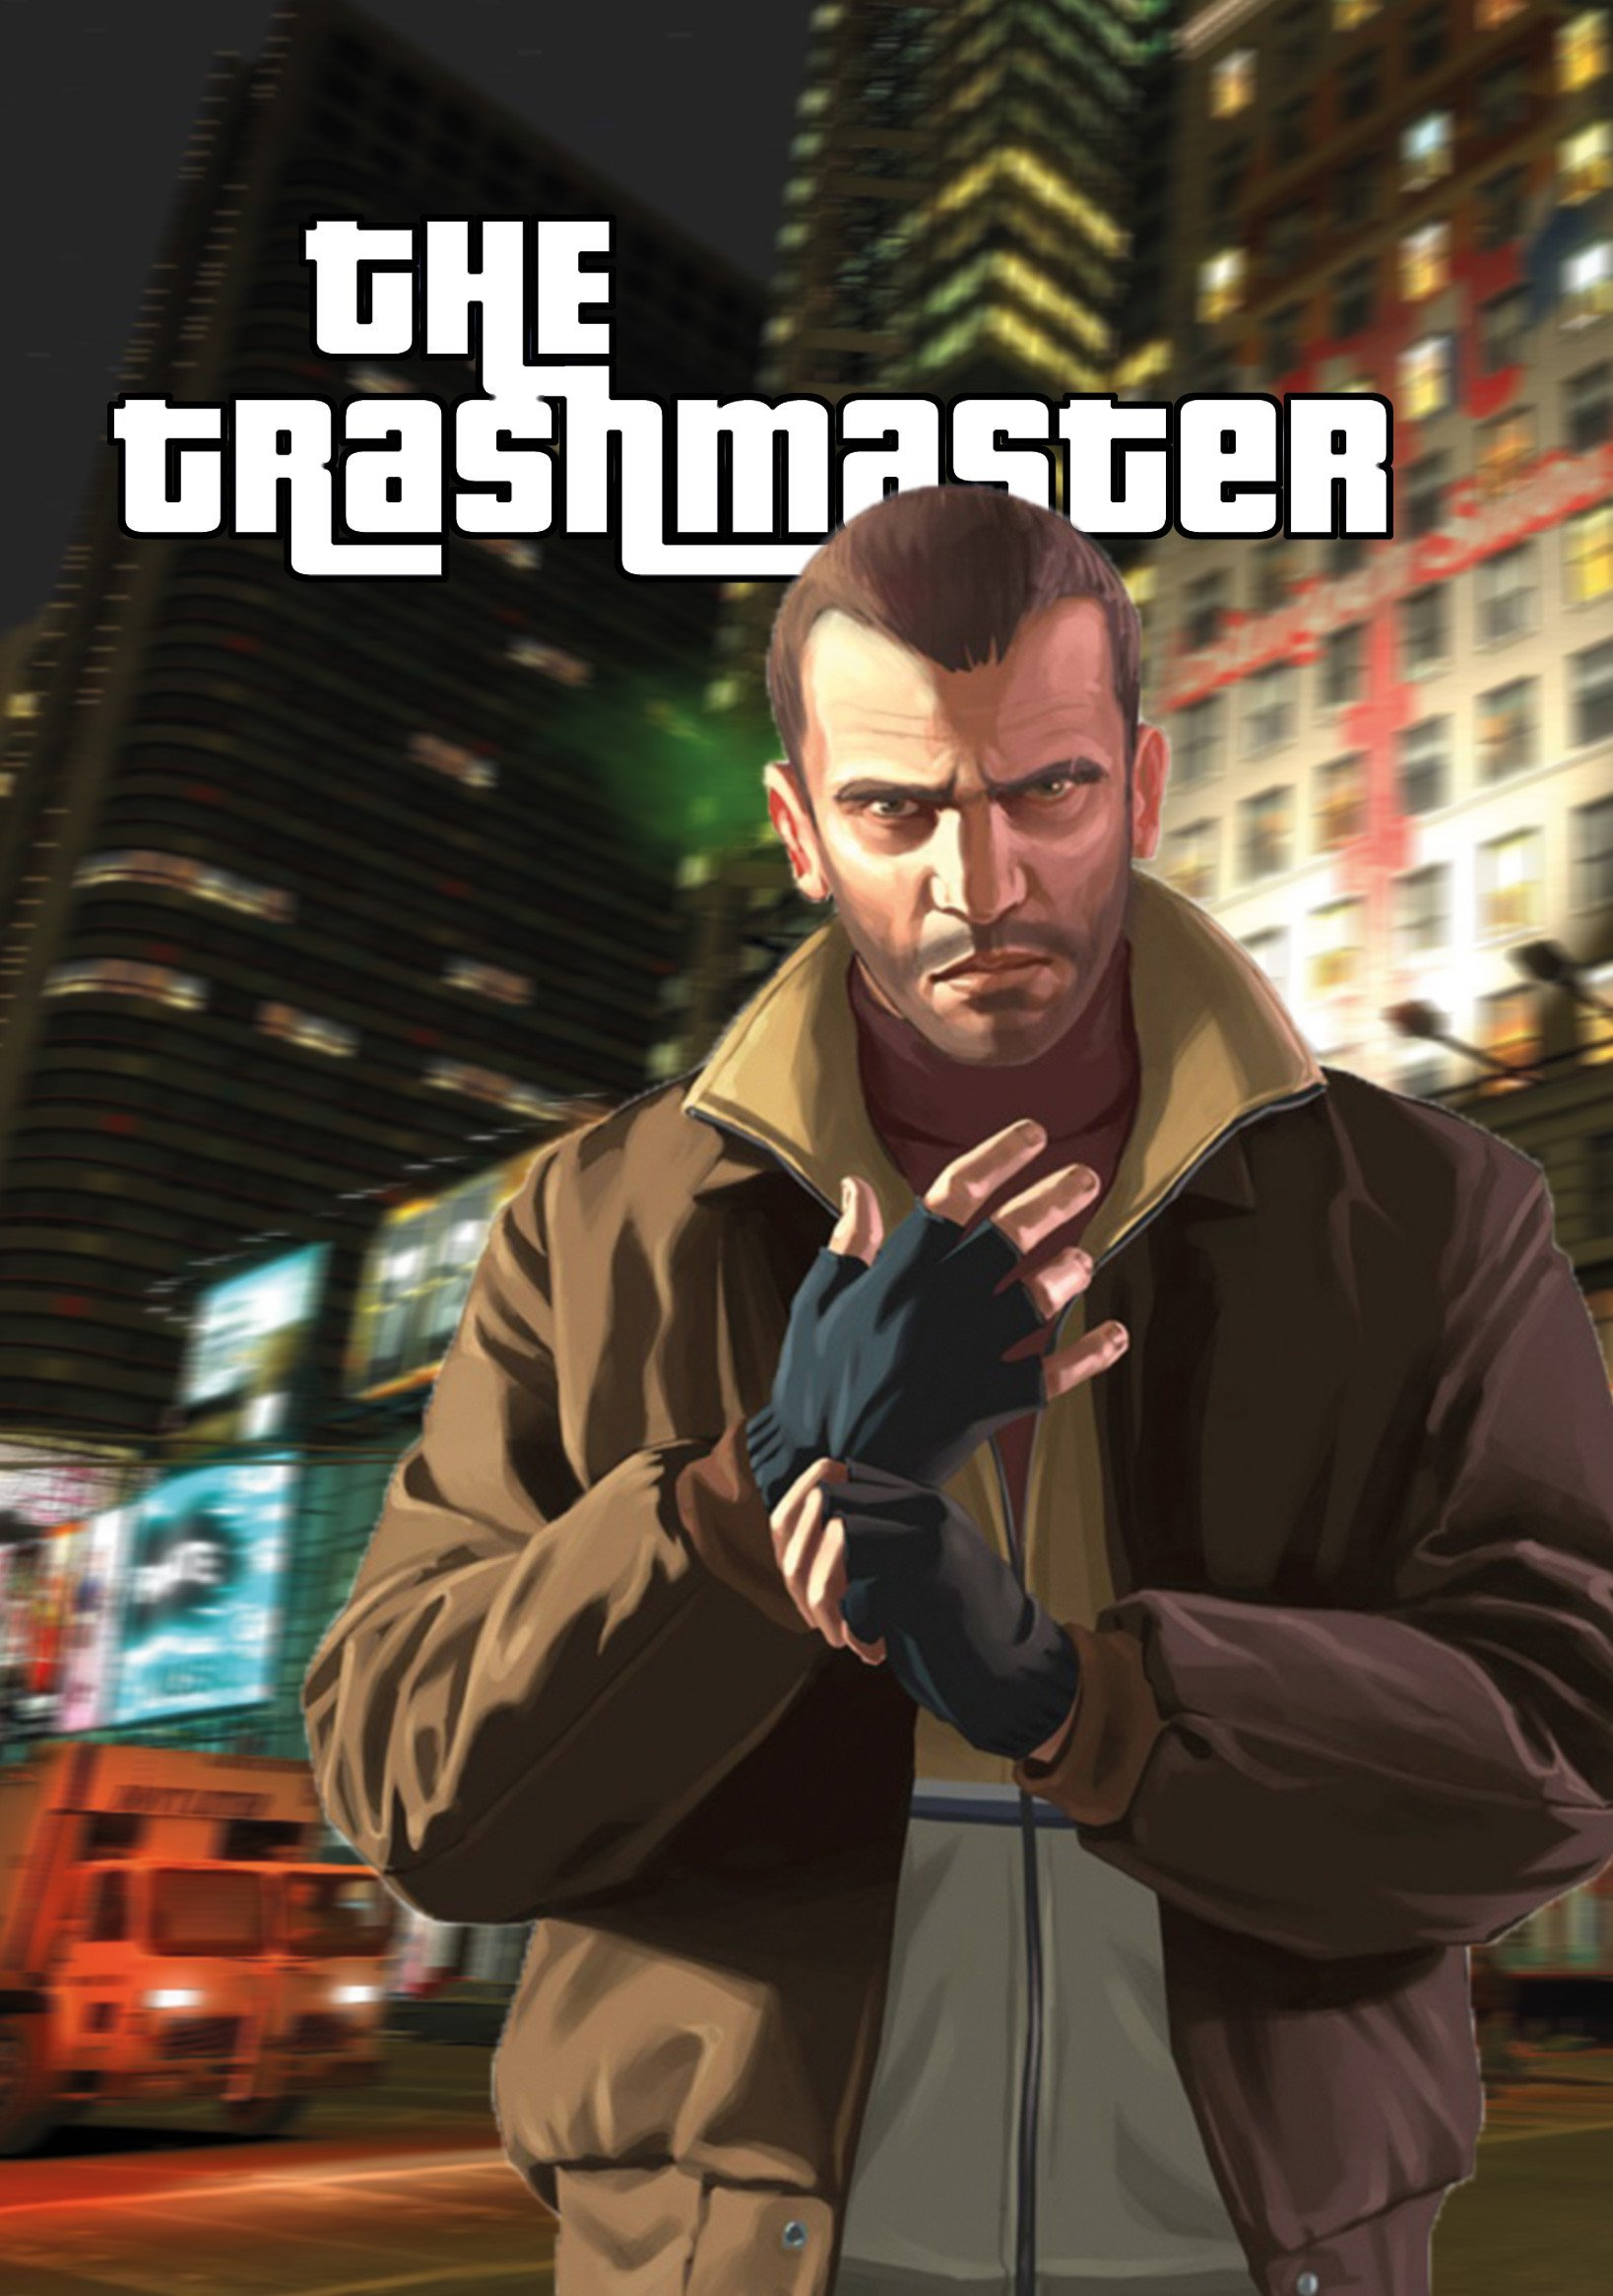 The Trashmaster (2010)